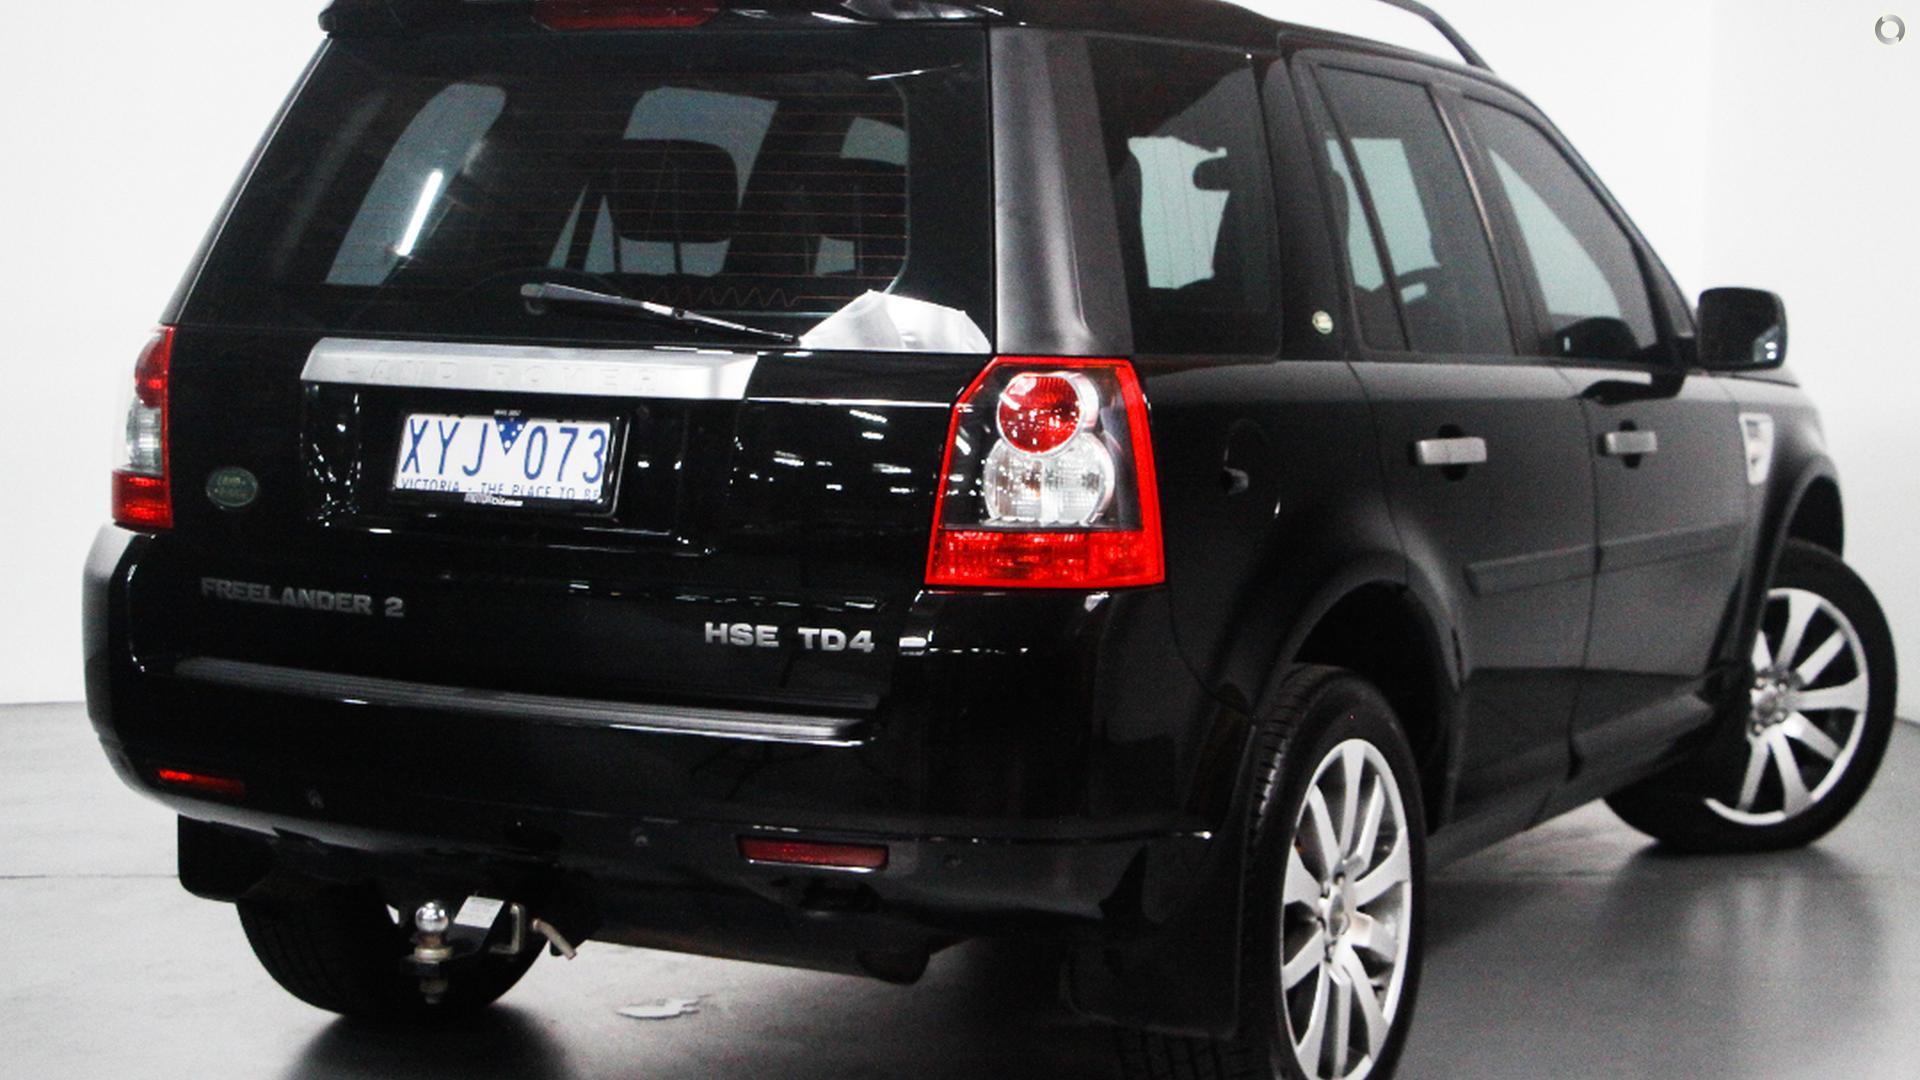 2009 Land Rover Freelander 2 Td4 HSE LF